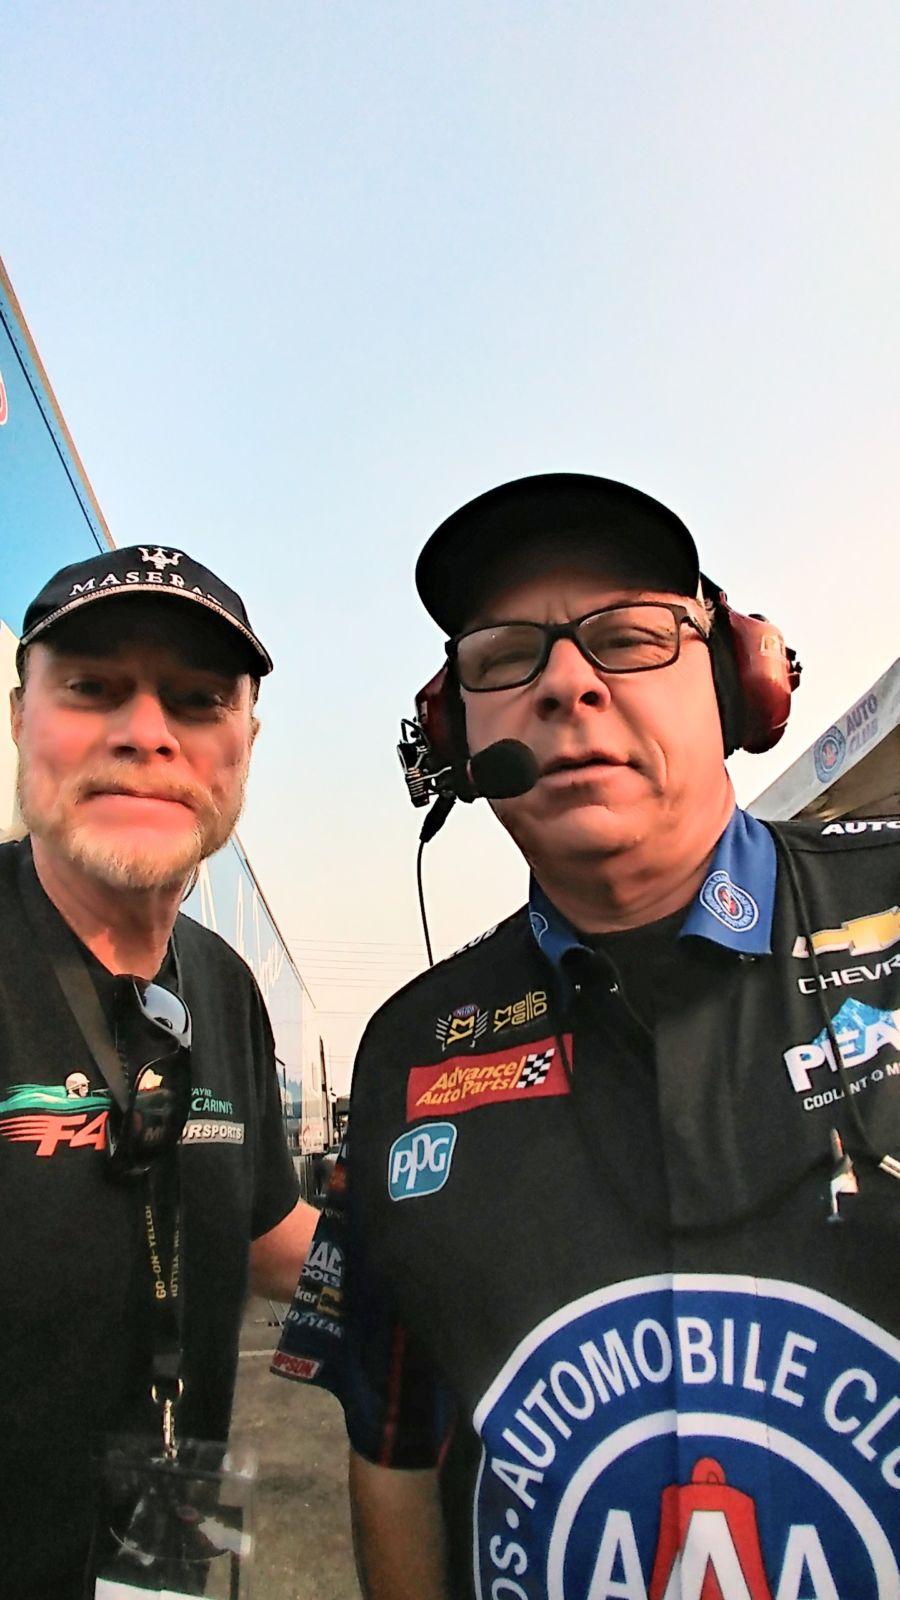 Gerry With Jimmy Prock Nhra Champion Funny Car Crew Chief Espco